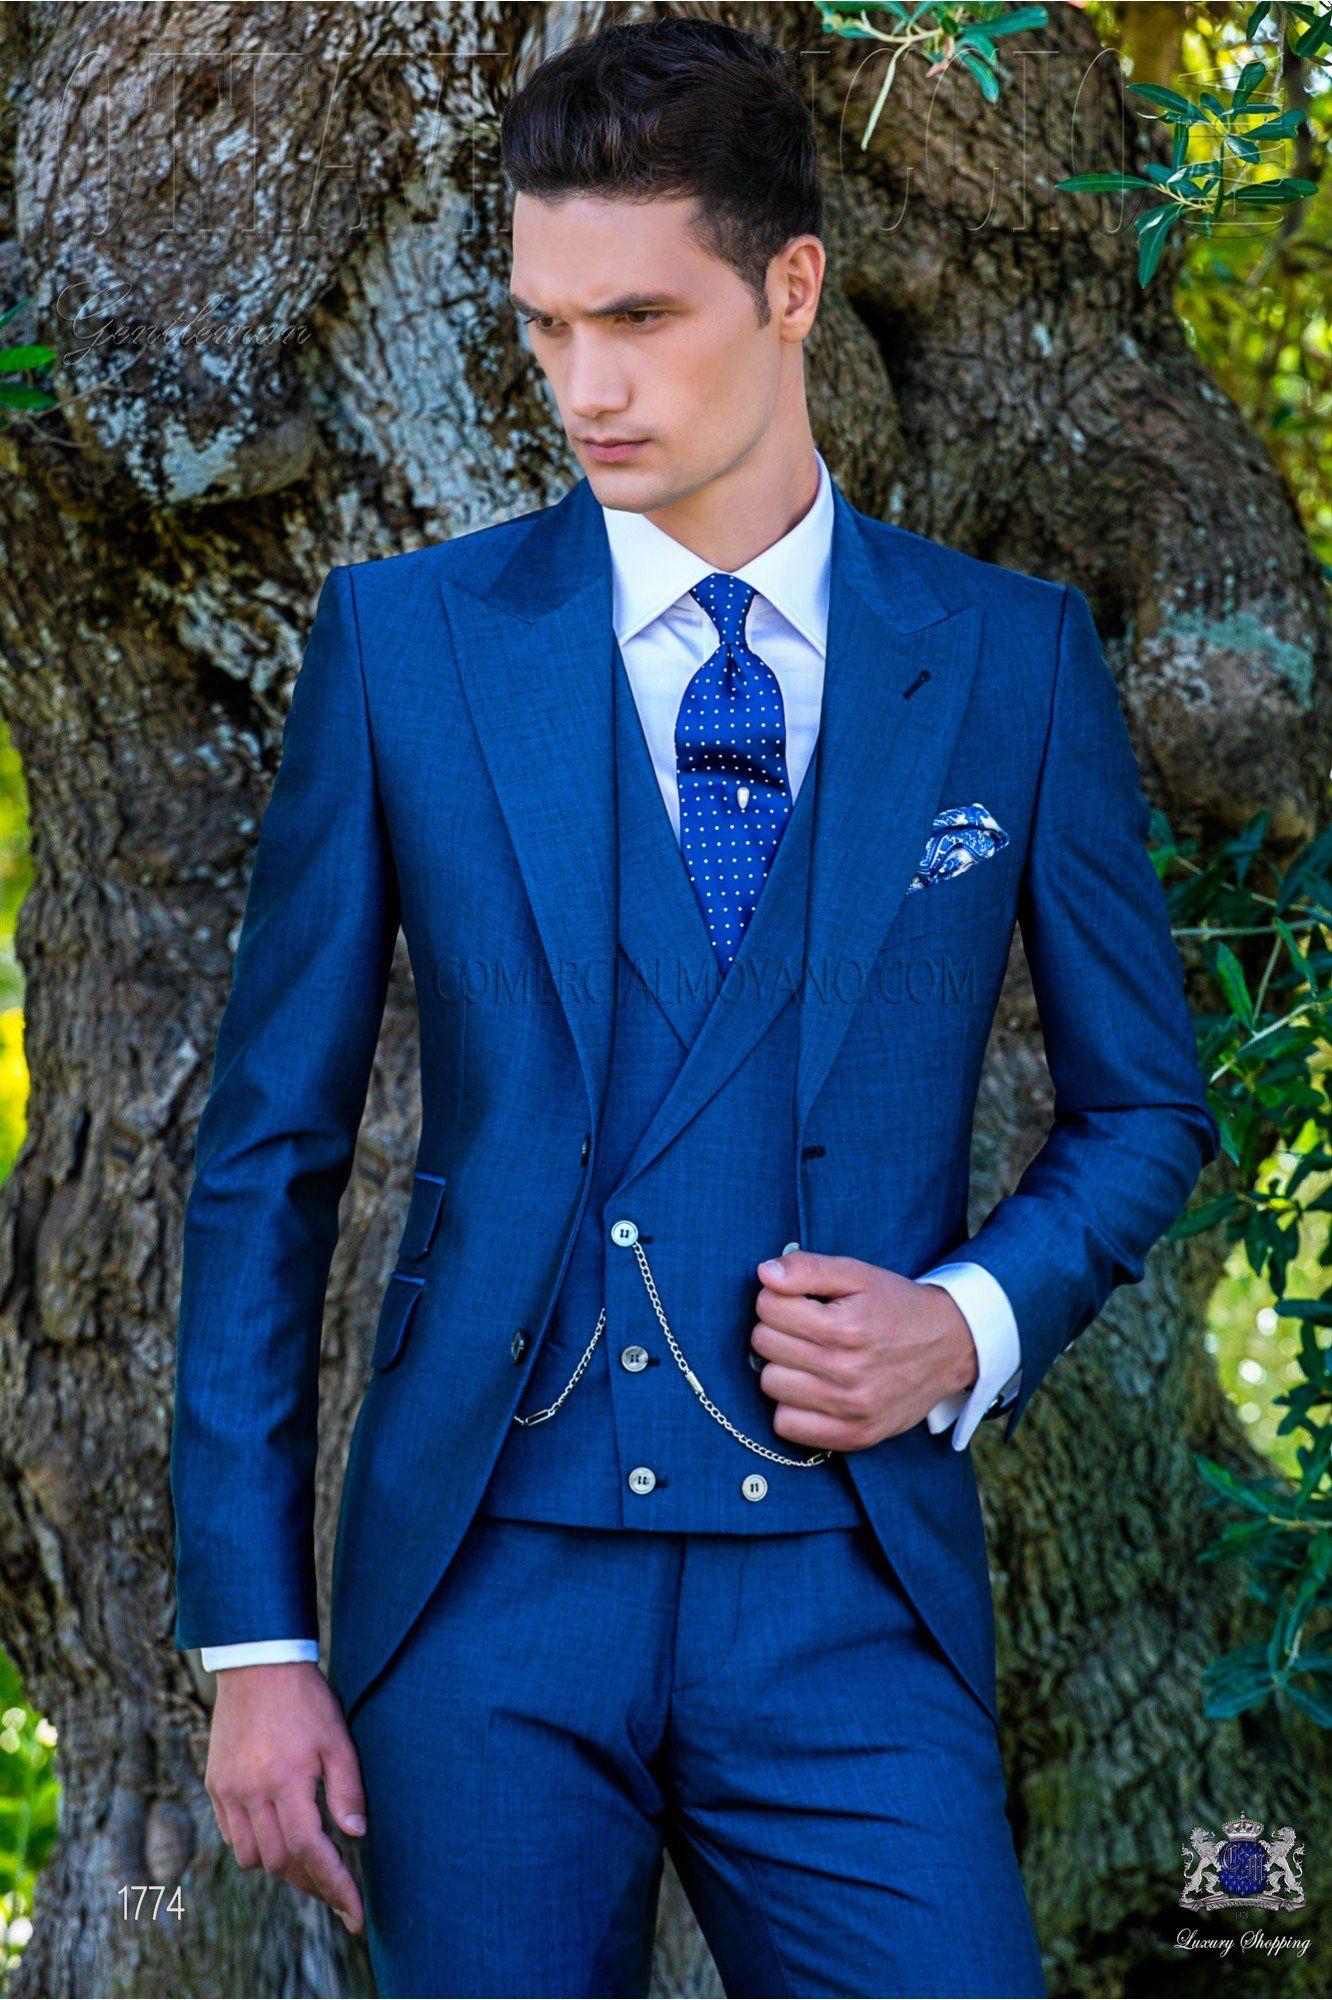 royal blaue anzug aus mohair wollmischung alpaka mode pinterest blaue anz ge. Black Bedroom Furniture Sets. Home Design Ideas